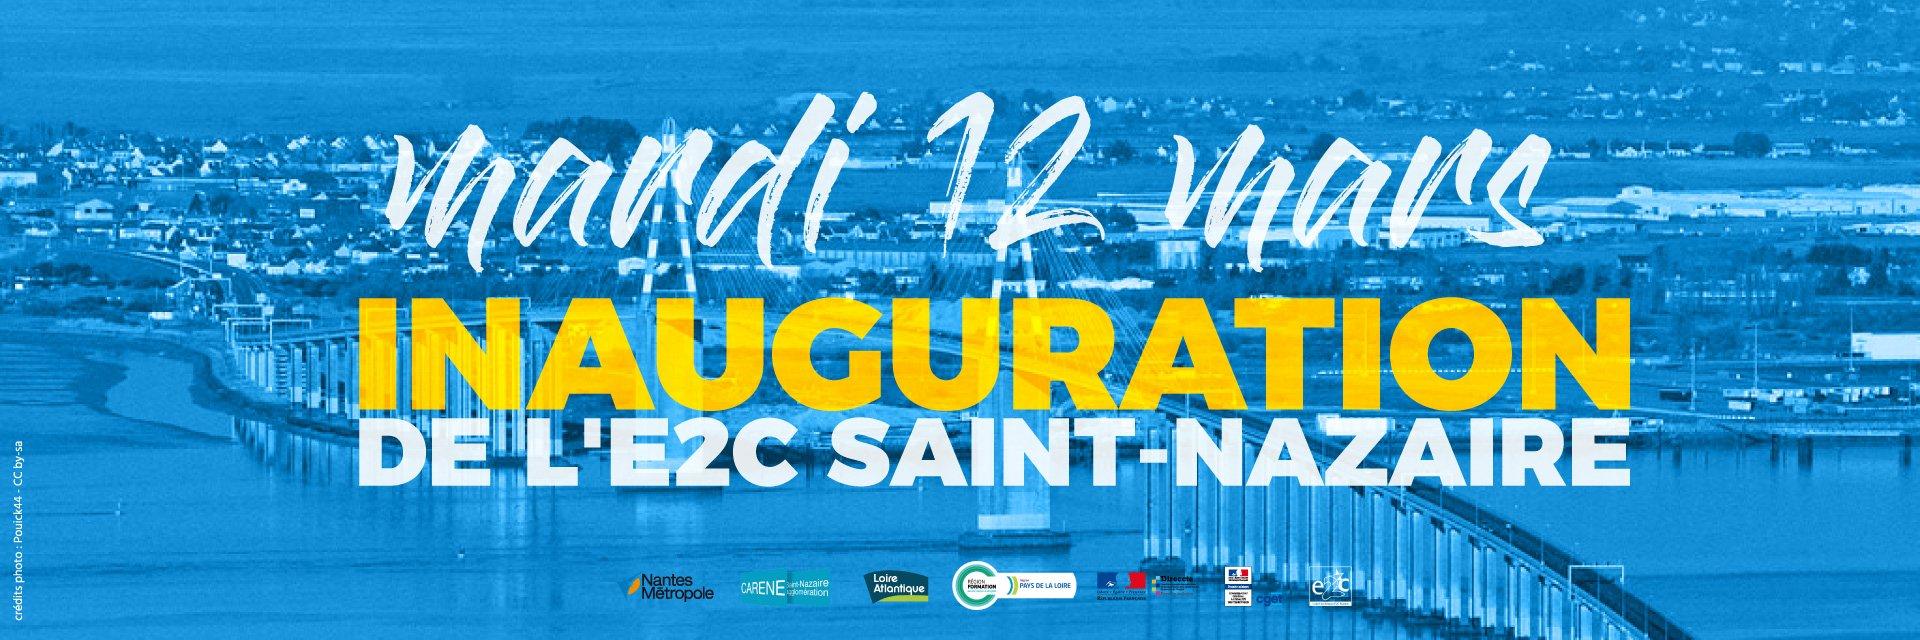 inauguration e2c saint-nazaire